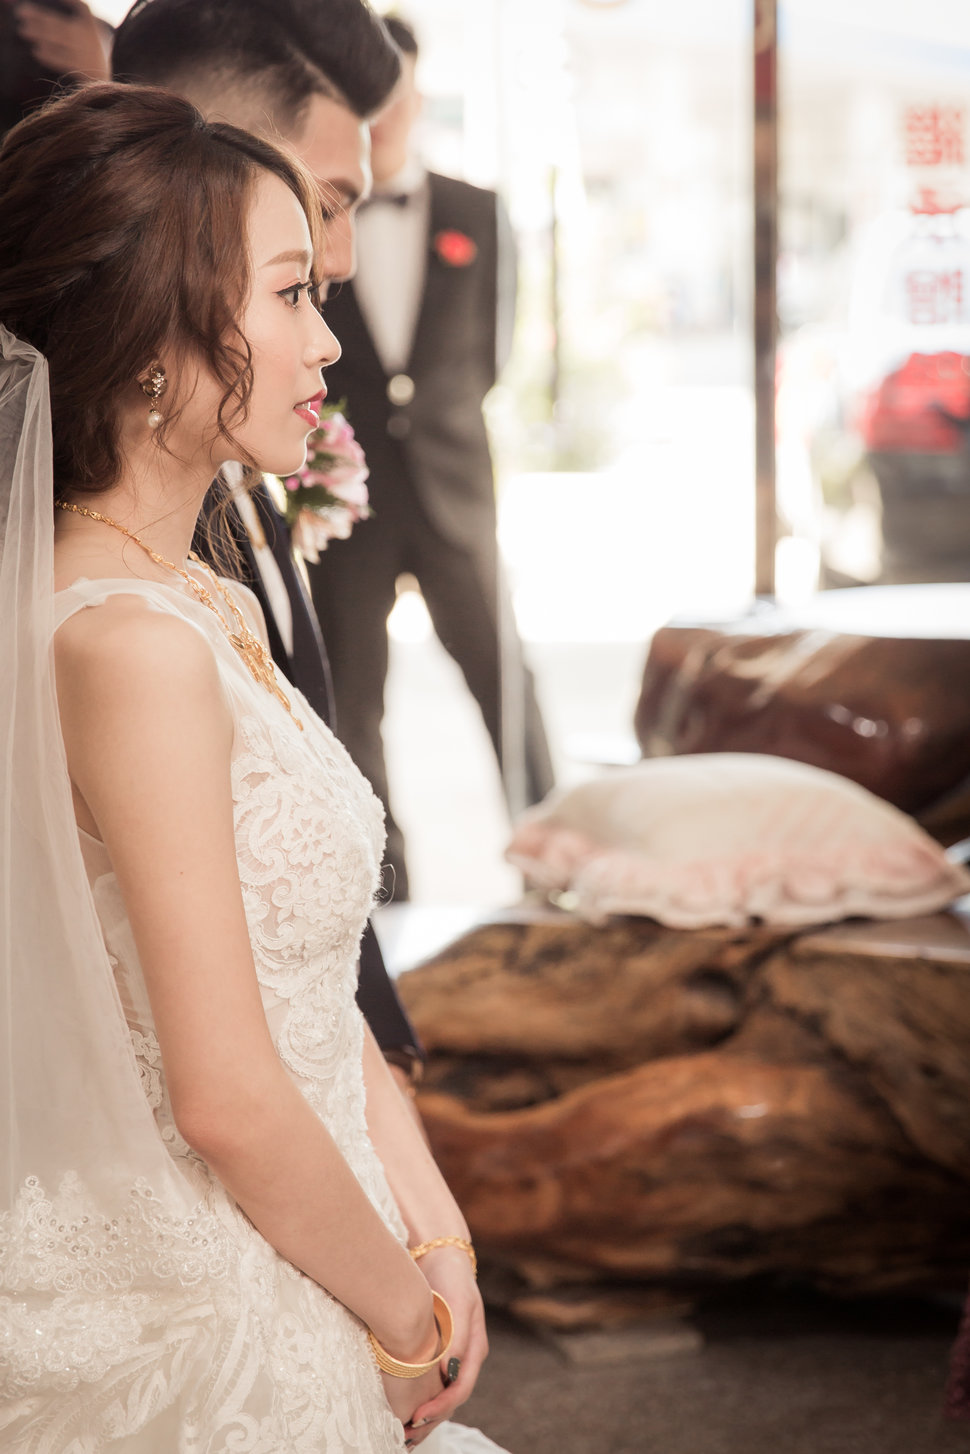 CHIN2416 - 哪隻狗Nacko《結婚吧》